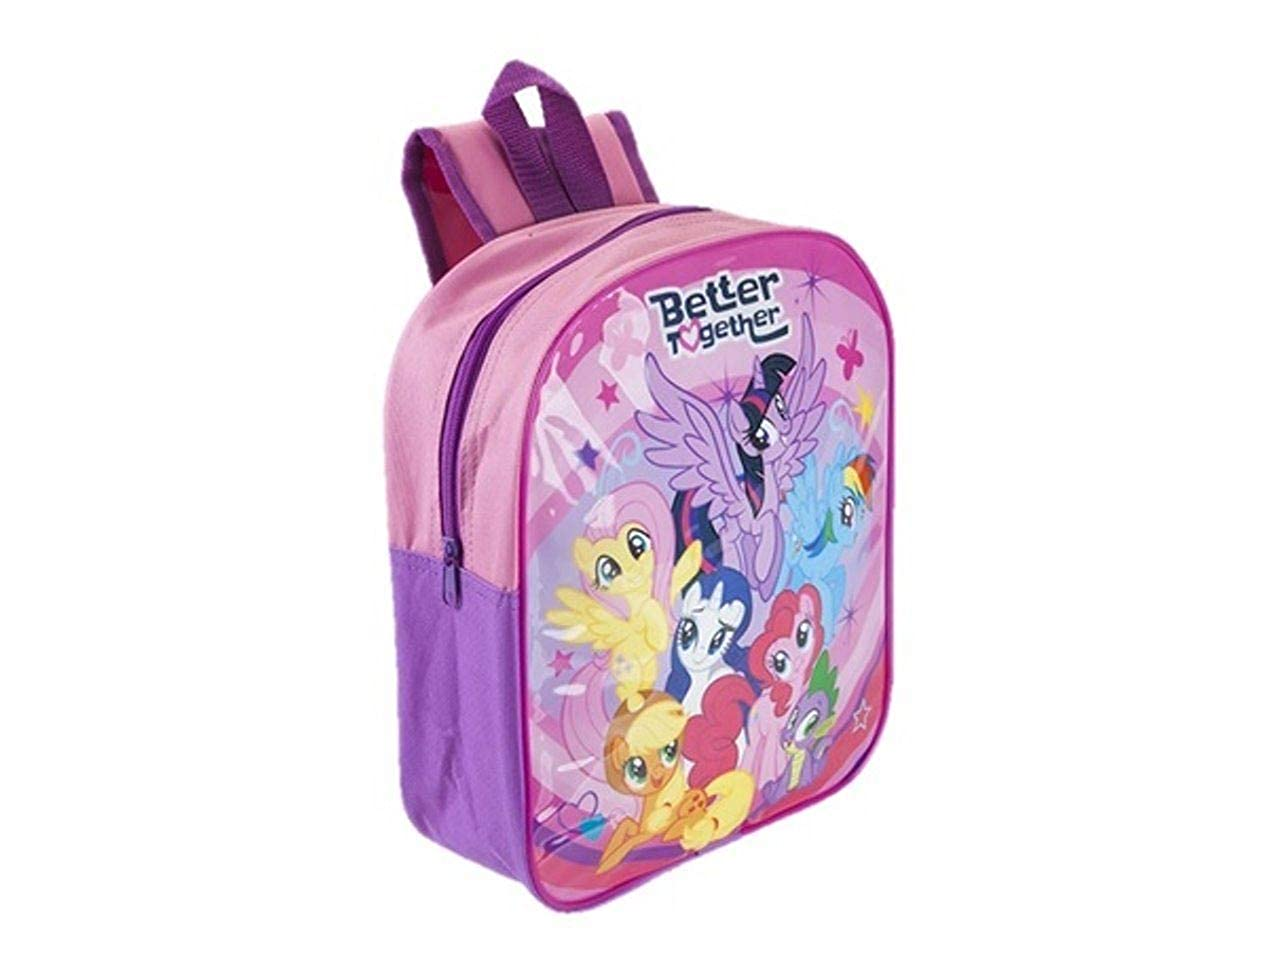 Childrens My Little Pony Backpack Bag Rucksack Gift